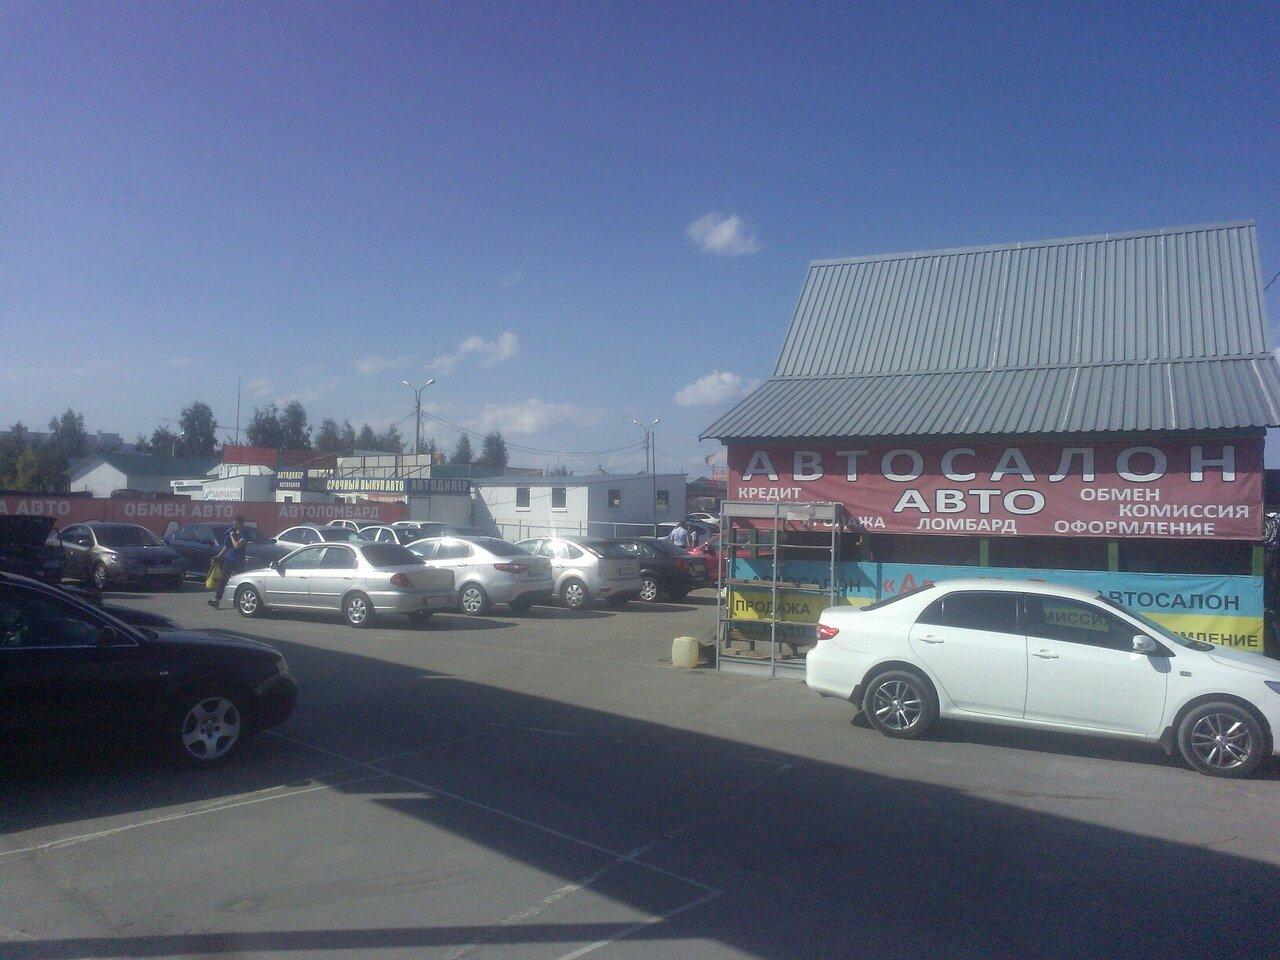 Авто из ломбарда рязань аренда автомобиля в вене без залога